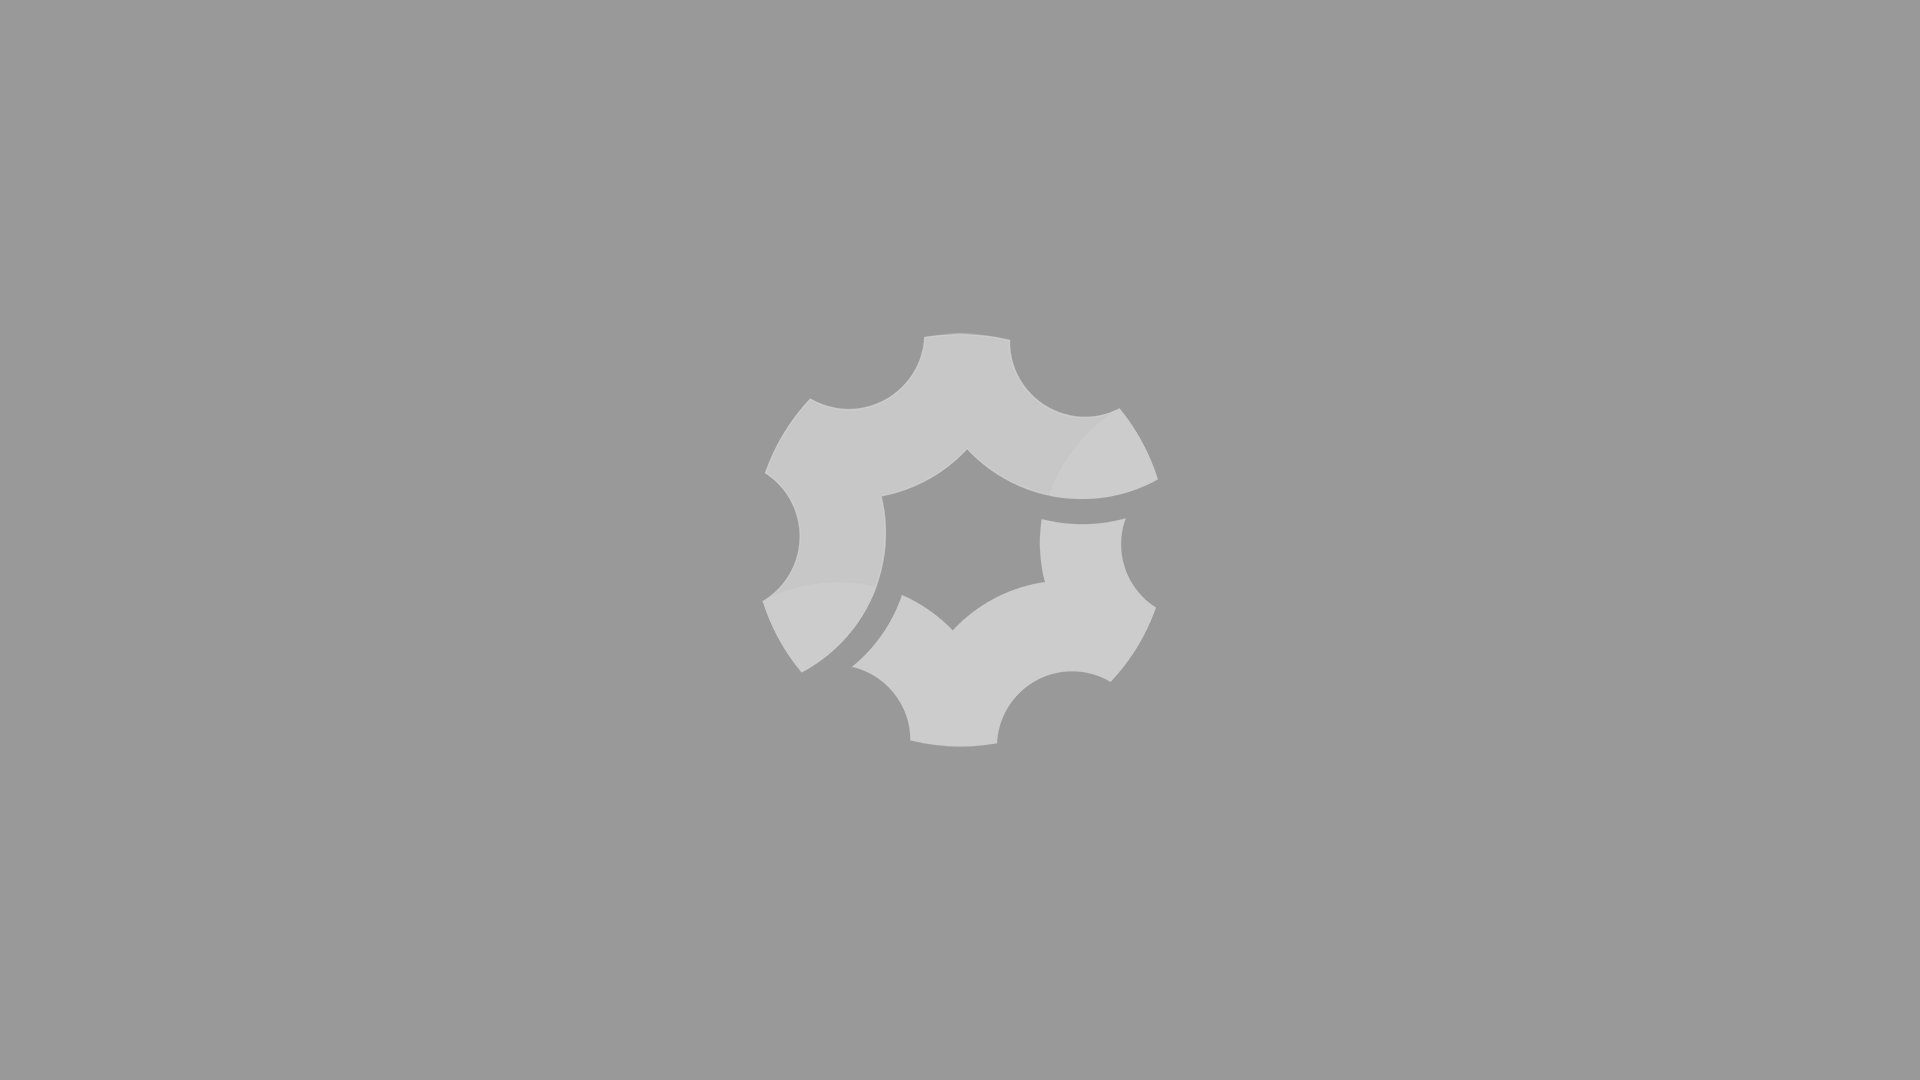 Retro Aliens_ UD-4L Dropship Aliens